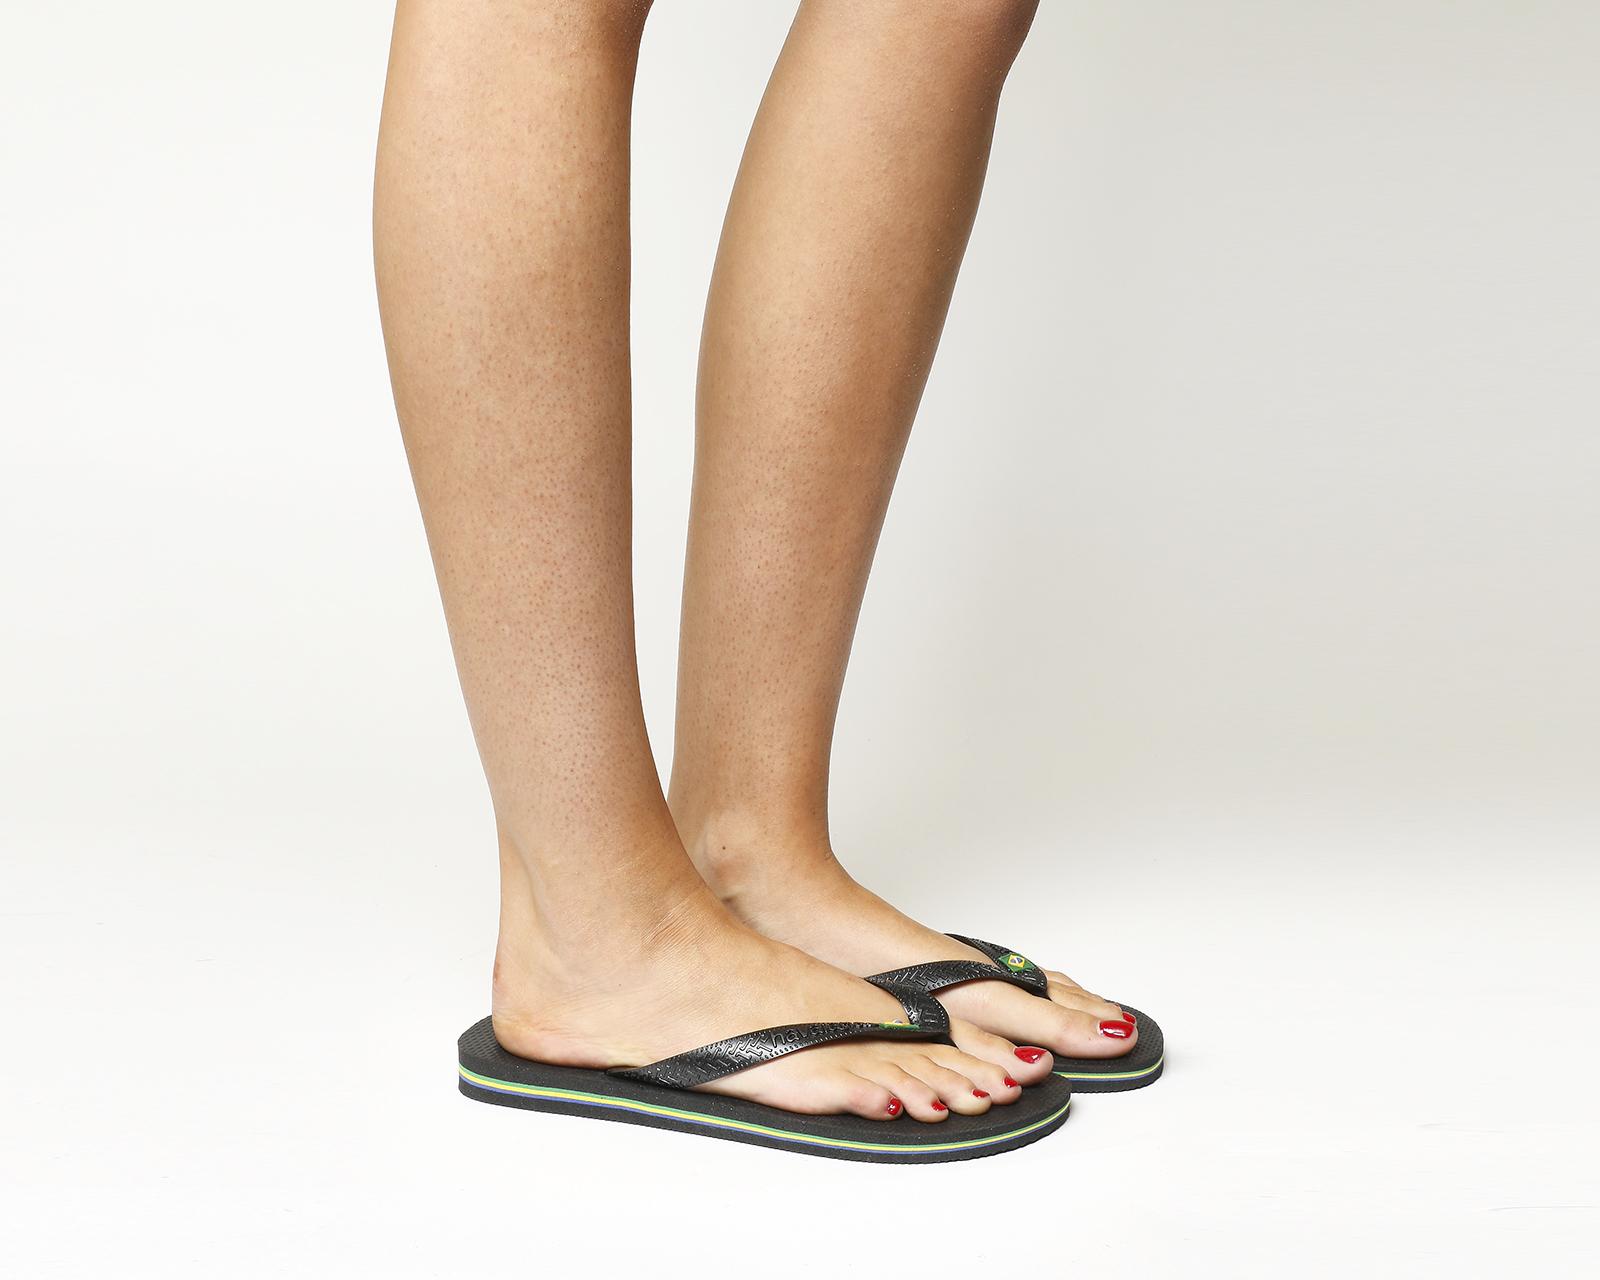 fe1a038af Sentinel Womens Havaianas Brazil Flip-Flop Black Rubber Sandals